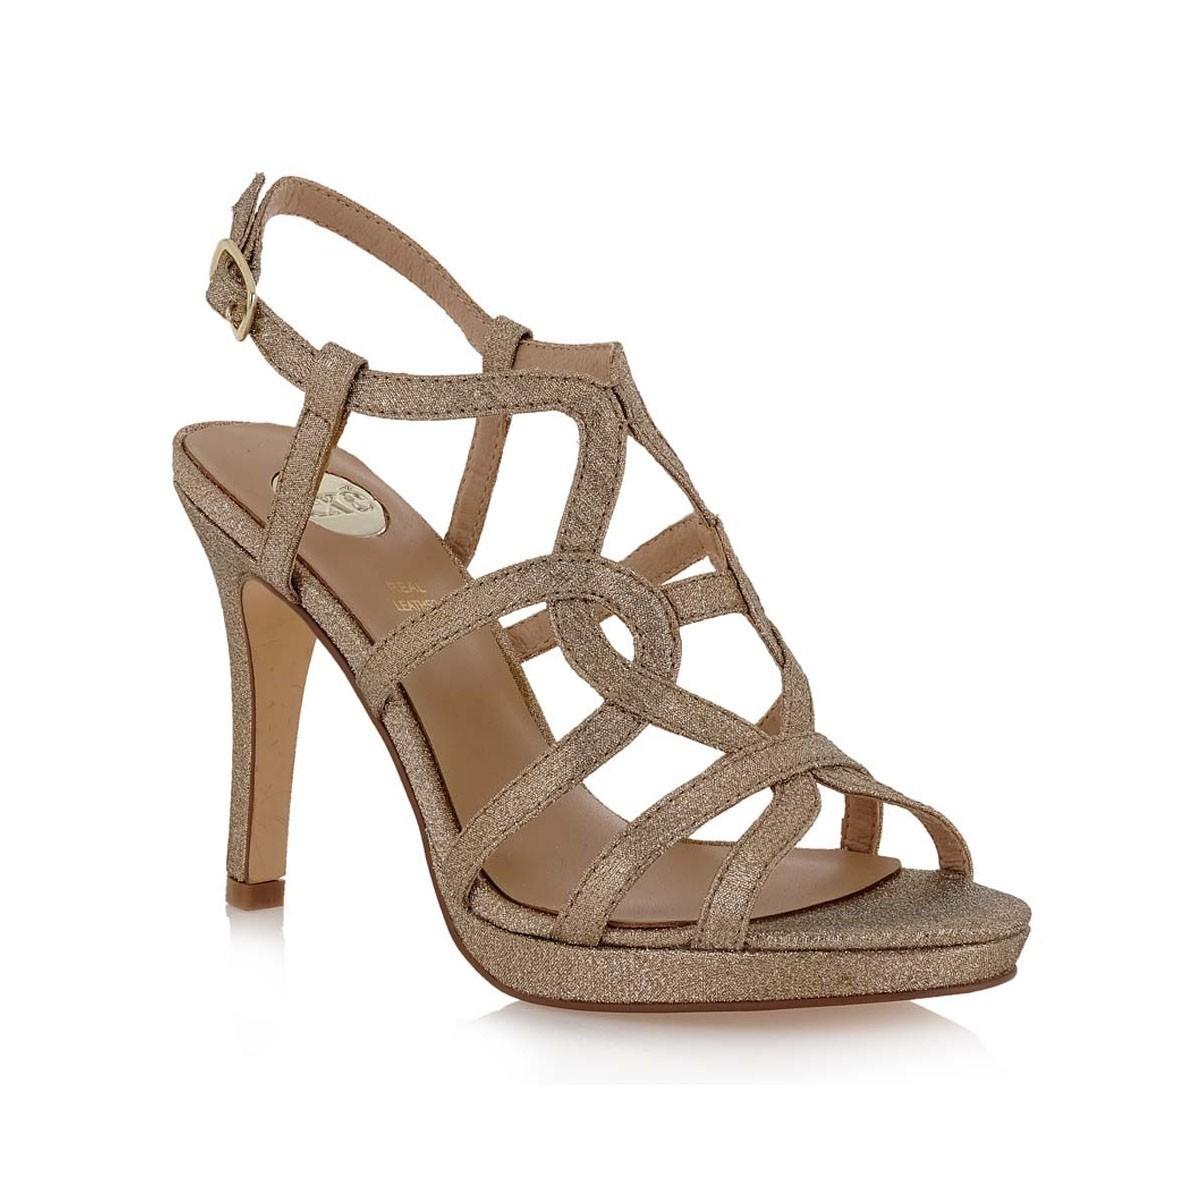 7f68e26e9a2 EXE Shoes Πέδιλα Γυναικεία KIMBERLY-646 Πλατίνα Glitter G4700646656S ...